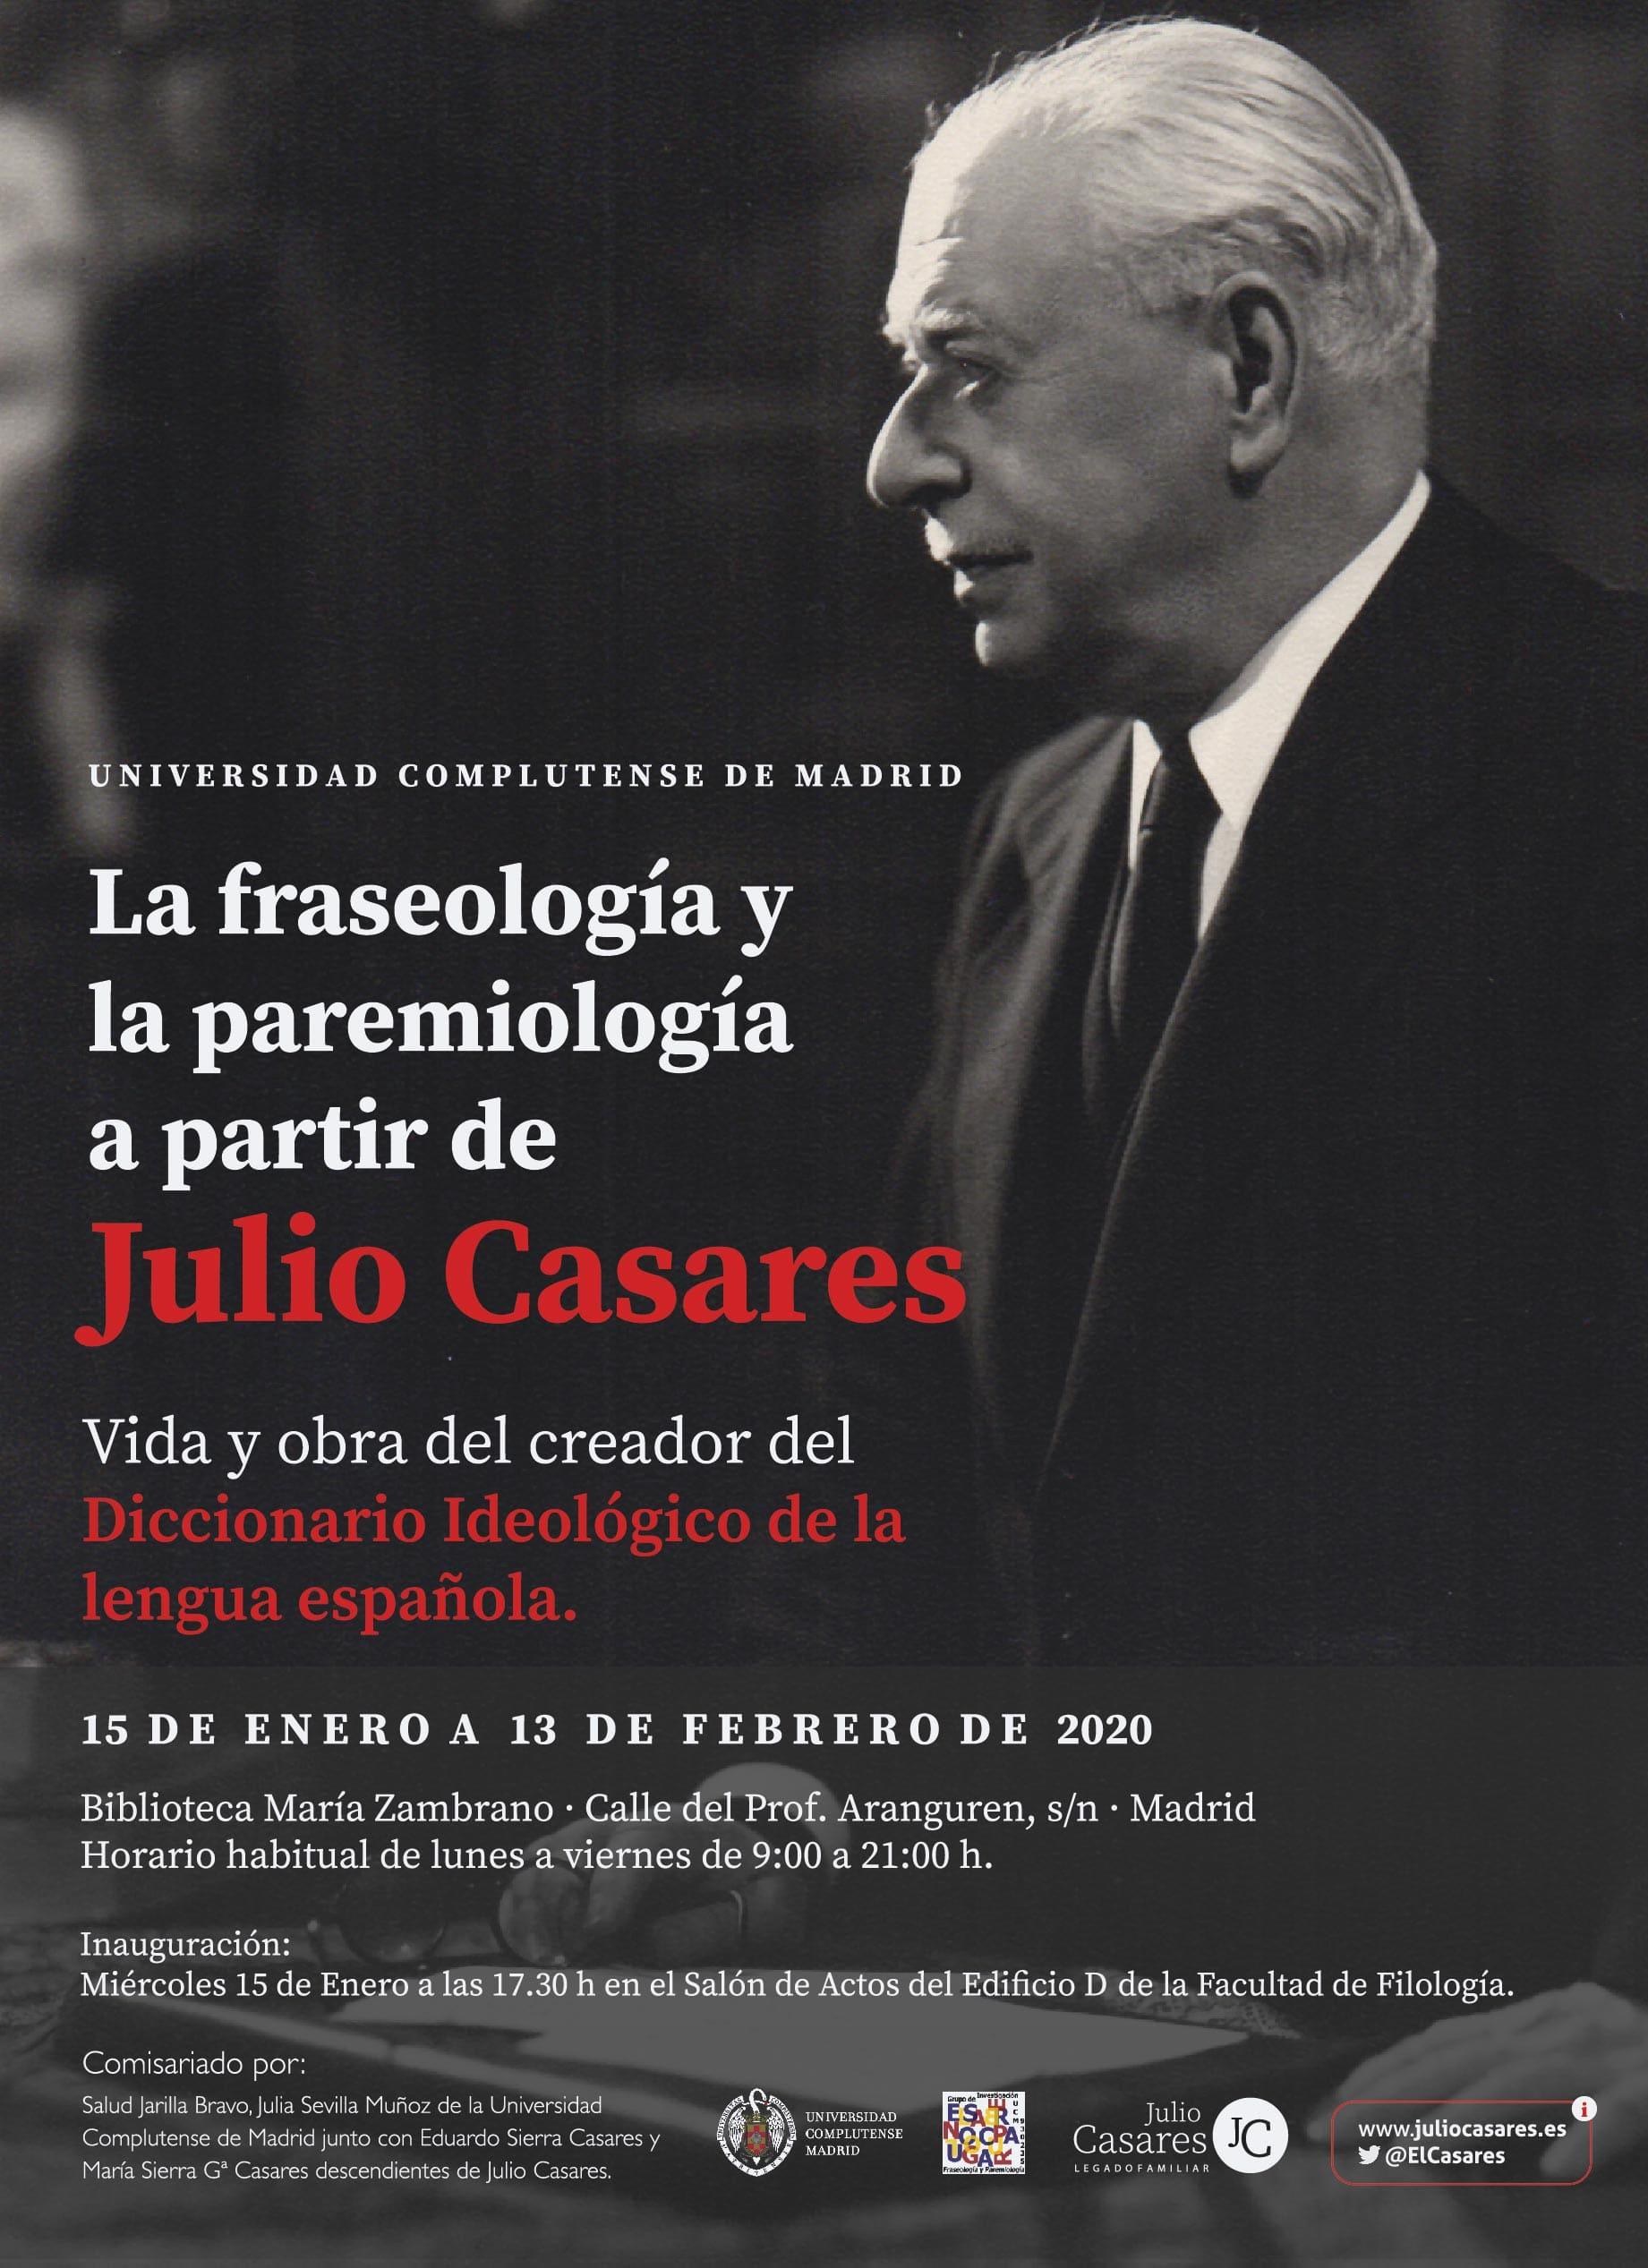 Exposición sobre Julio Casares